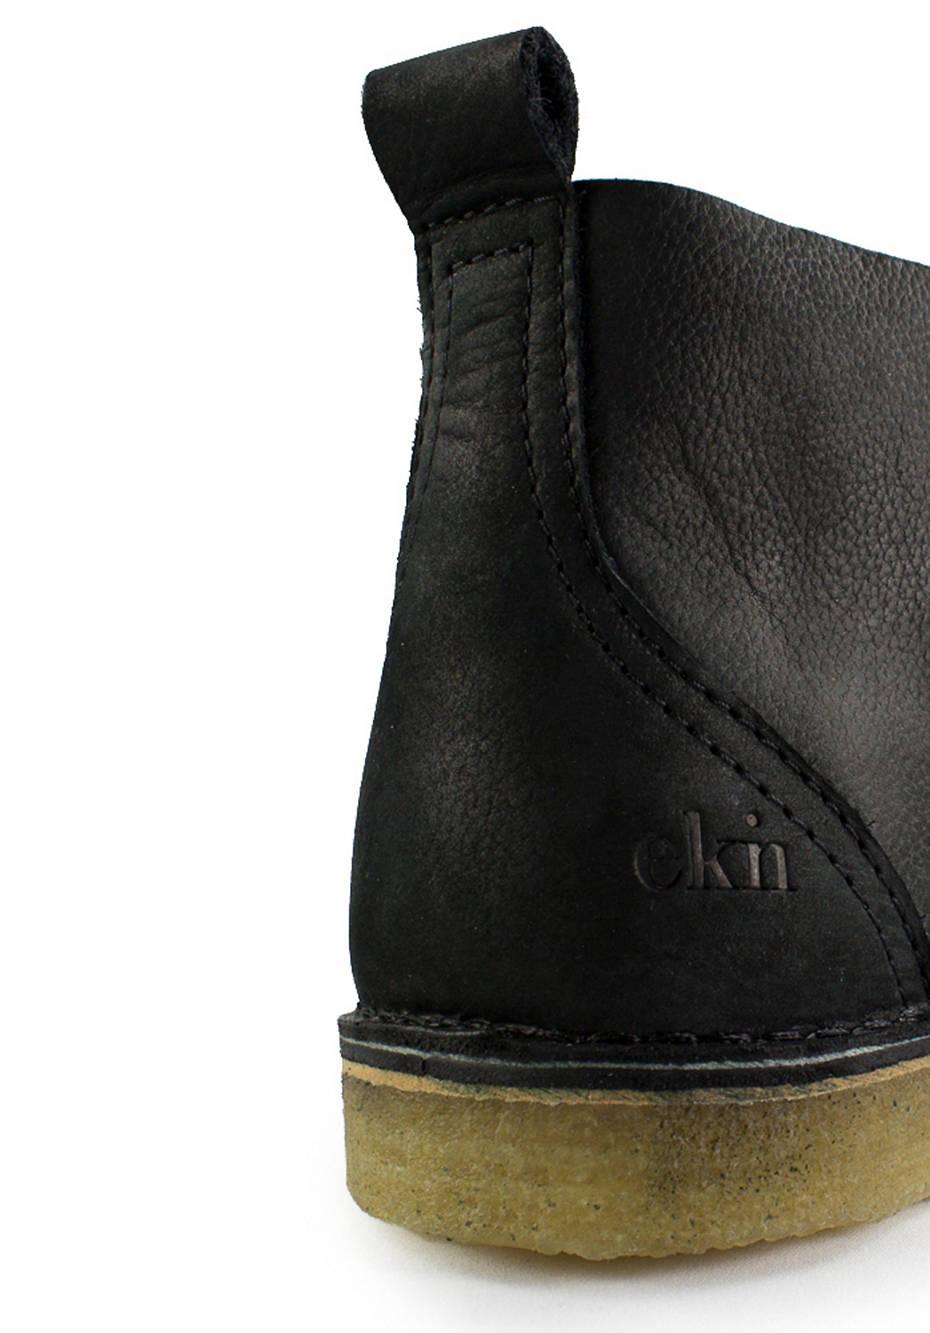 Max Herre / Black Leather